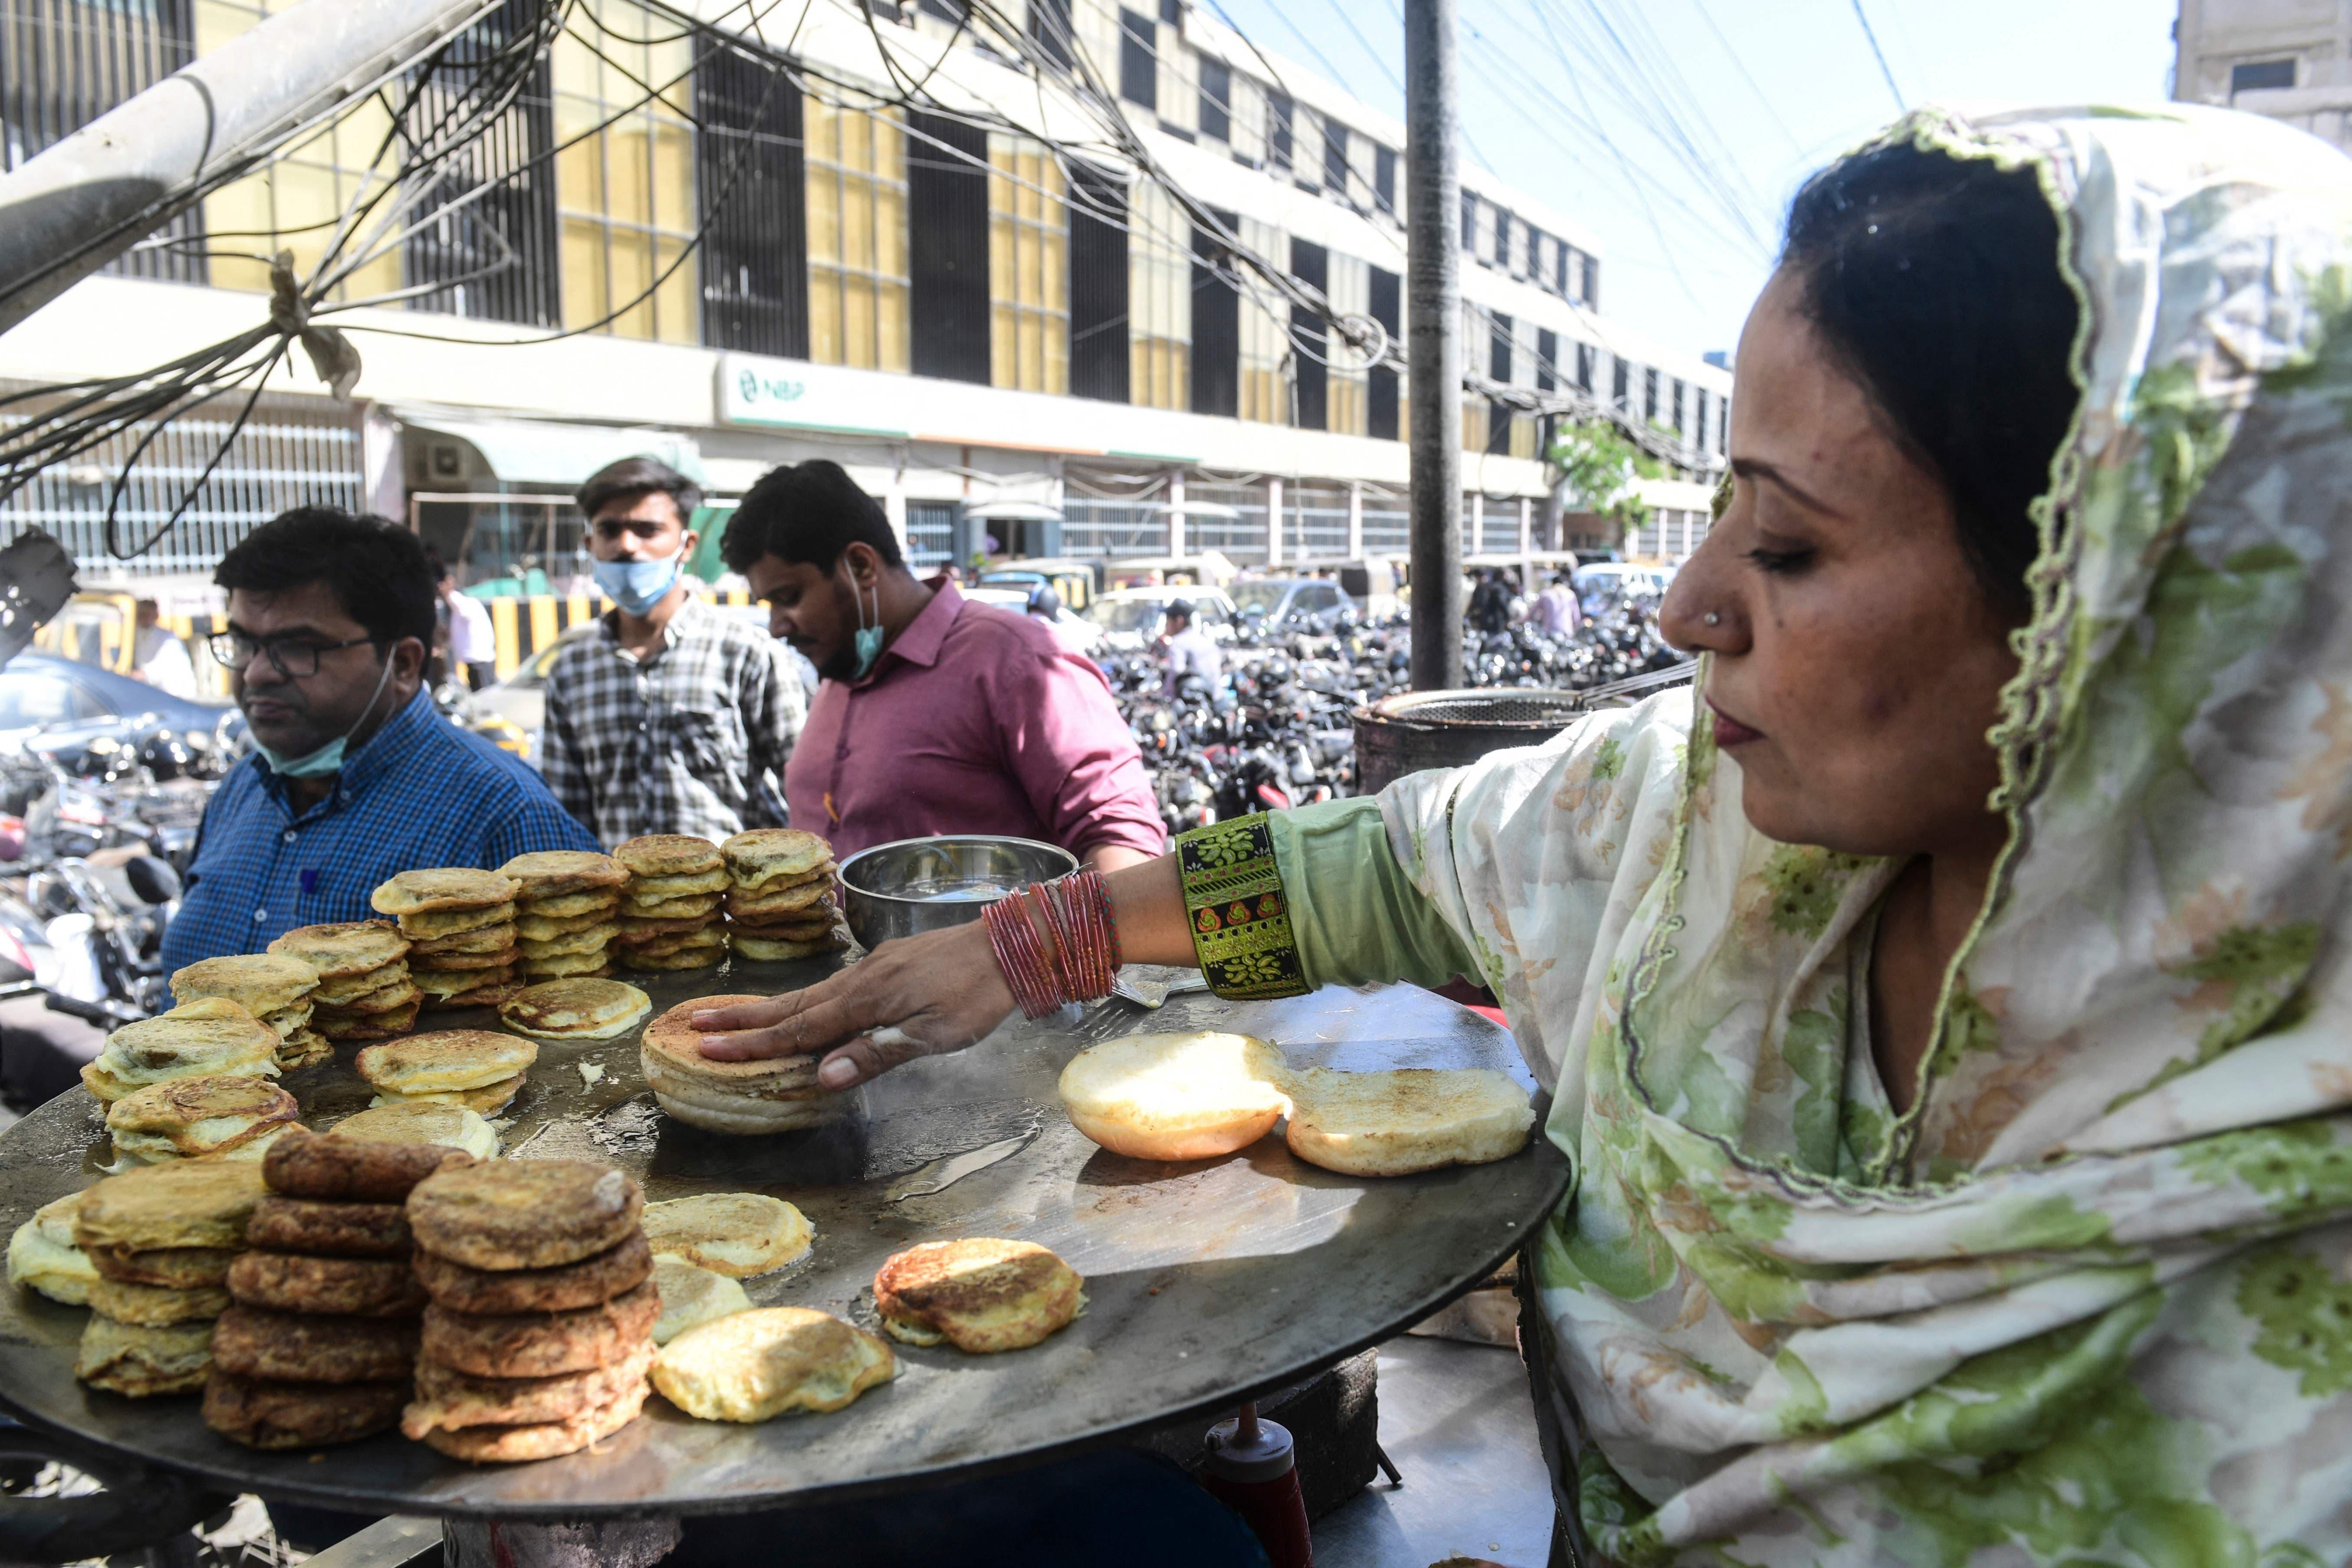 Street vendor Lubna Raheem (R) prepares snacks for customers at her roadside stall on International Women's Day in Karachi on March 8. — AFP